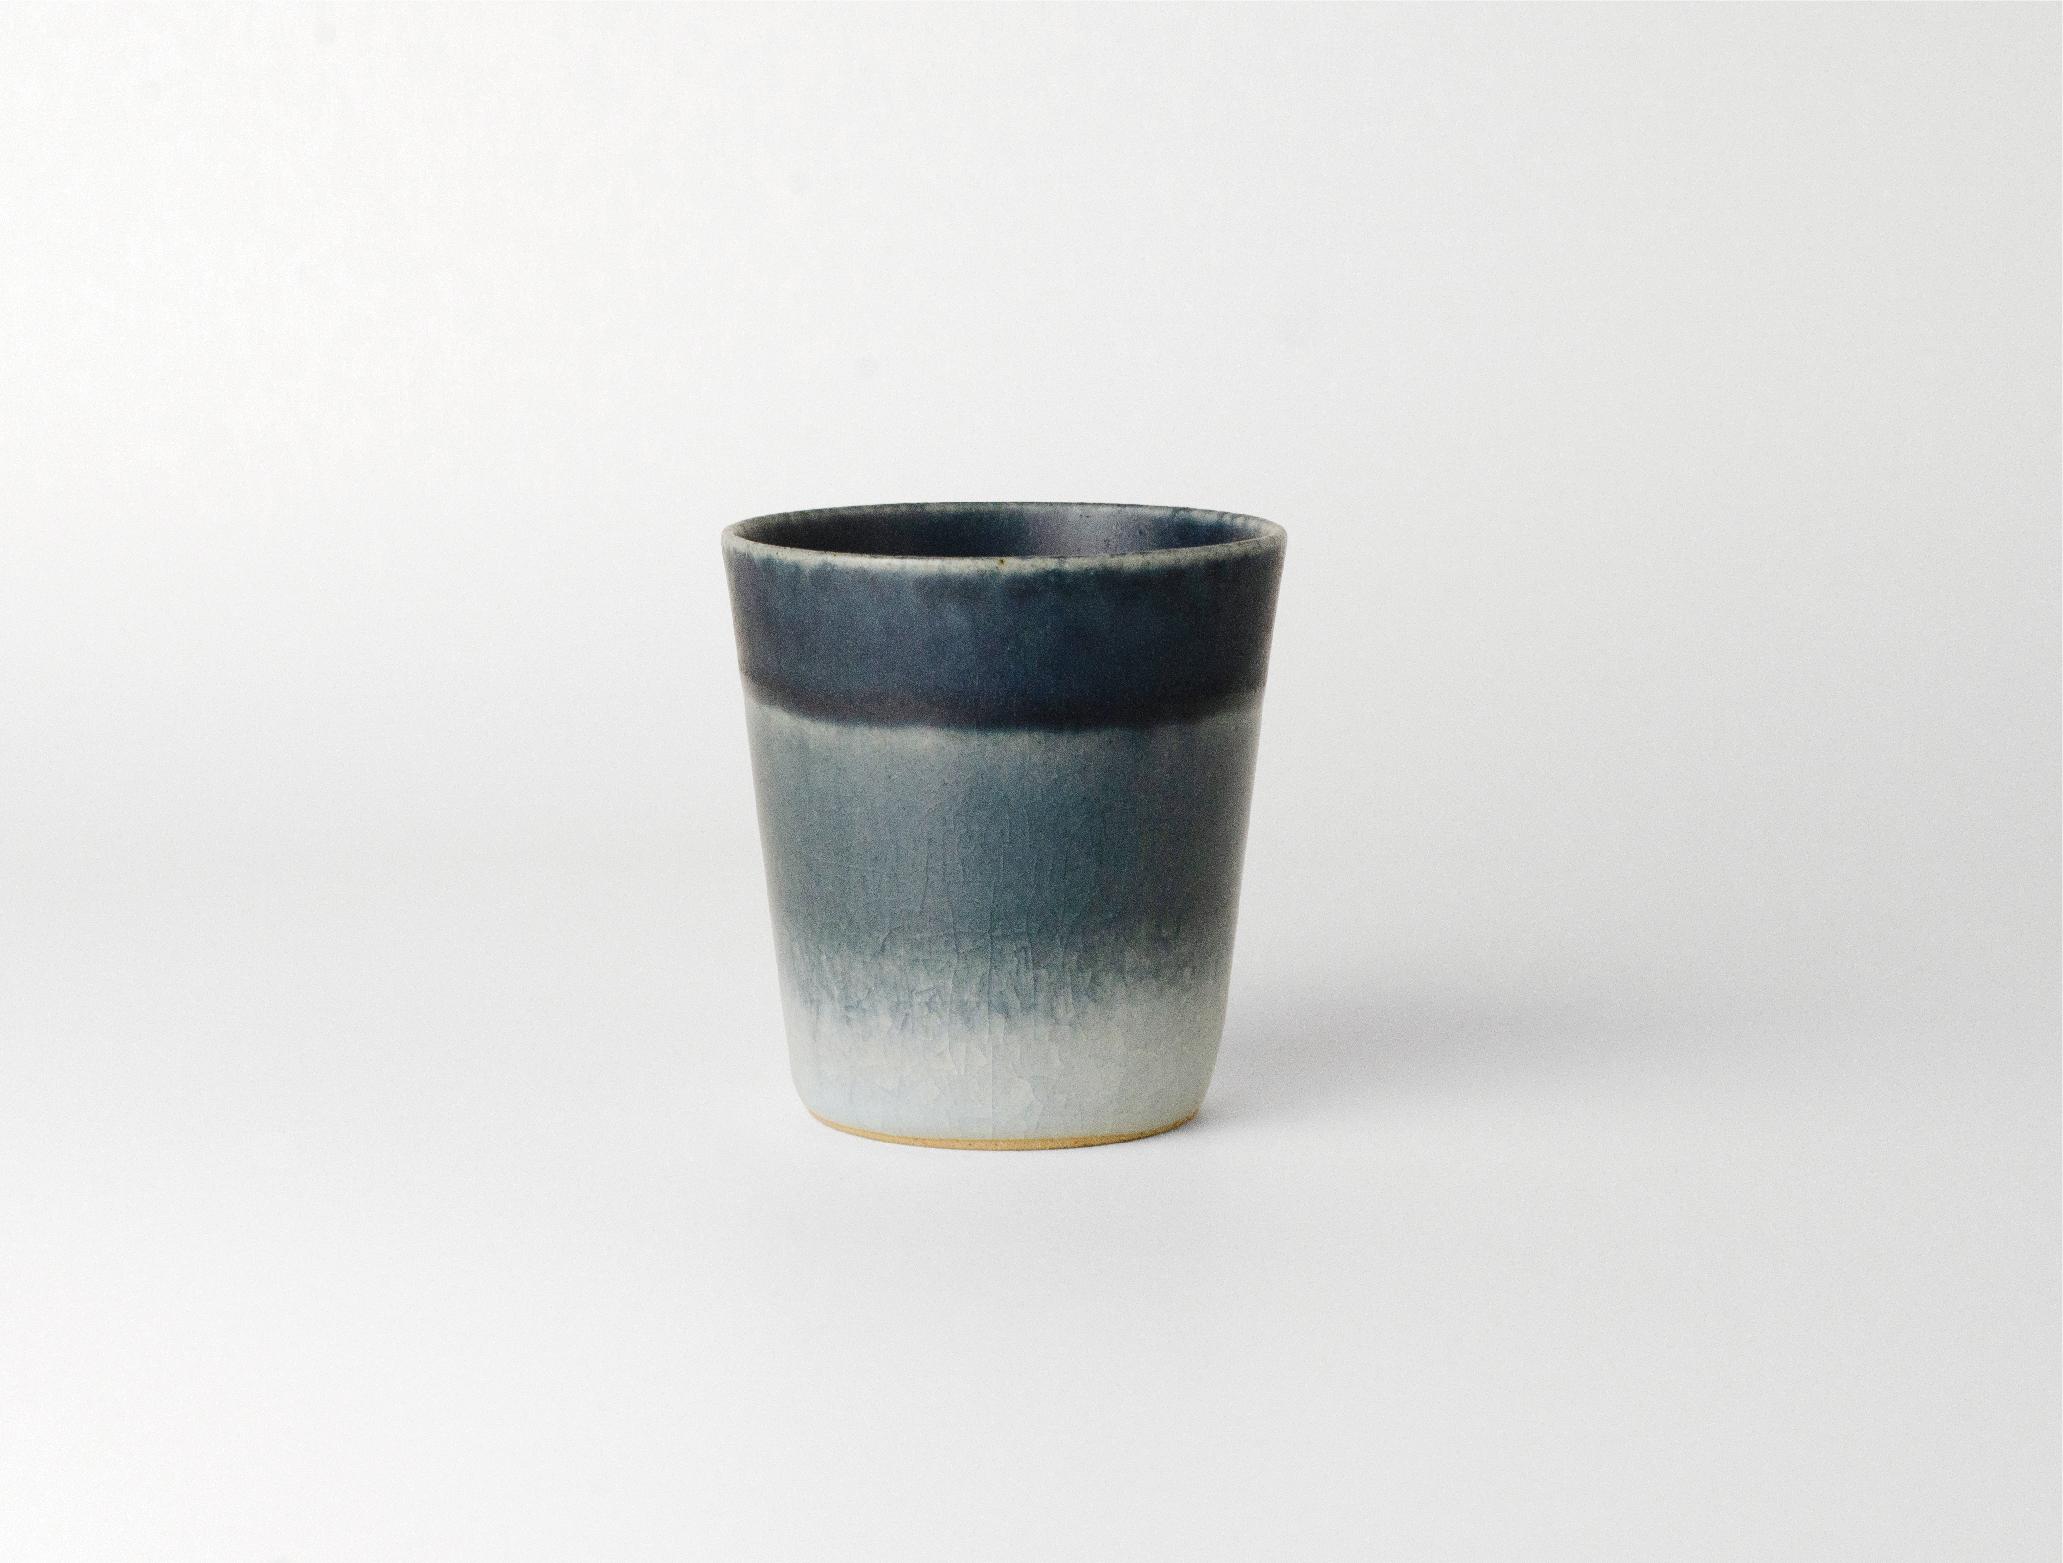 Fujisan_fuyu 120mlカップ イメージ